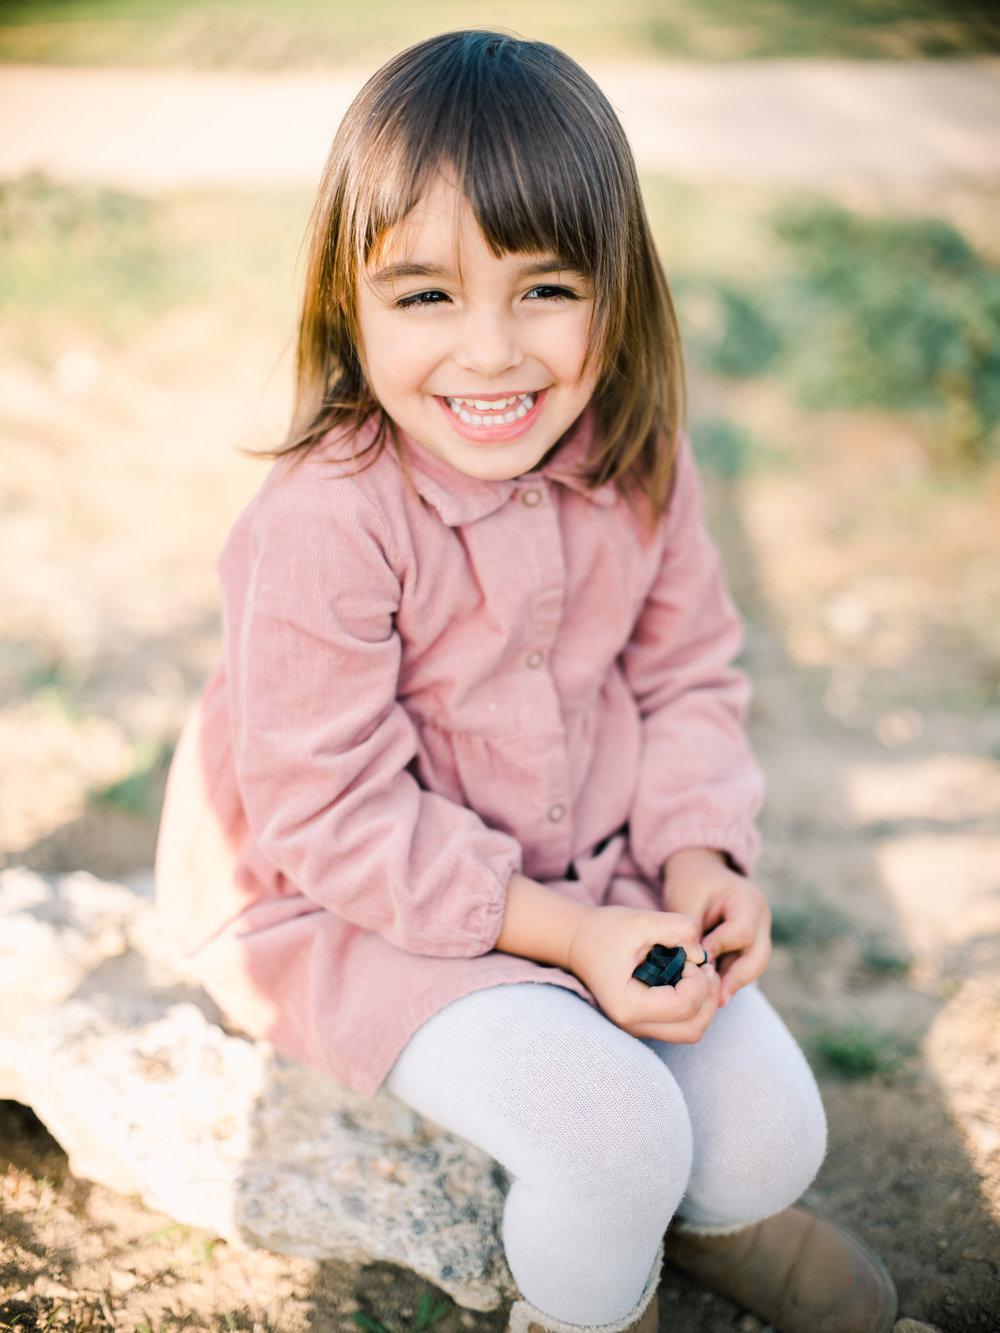 fotografia-infantil-niños-barcelona08.jpg